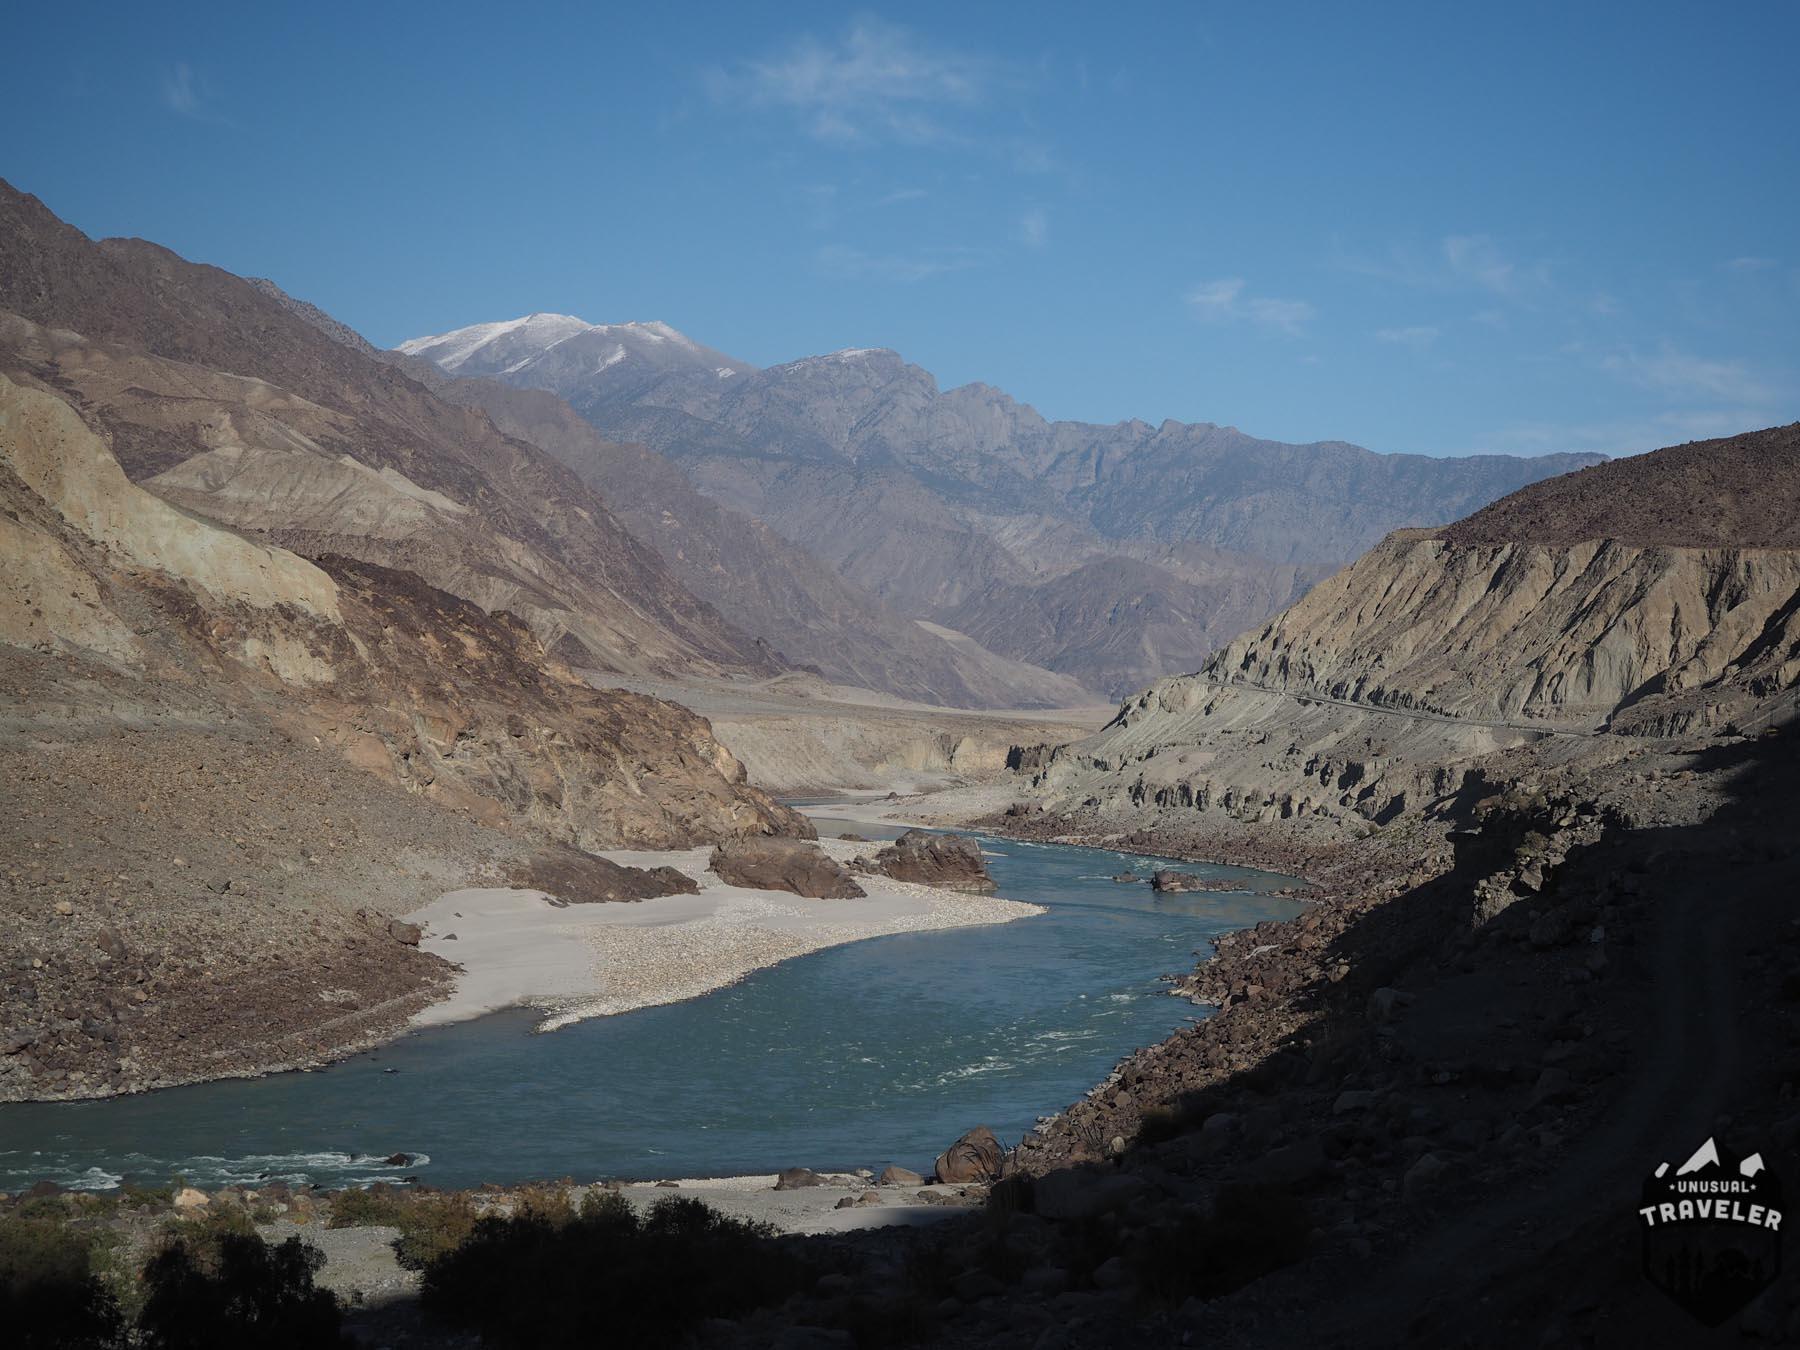 Karakoram Highway roadtrip on the Pakistan side